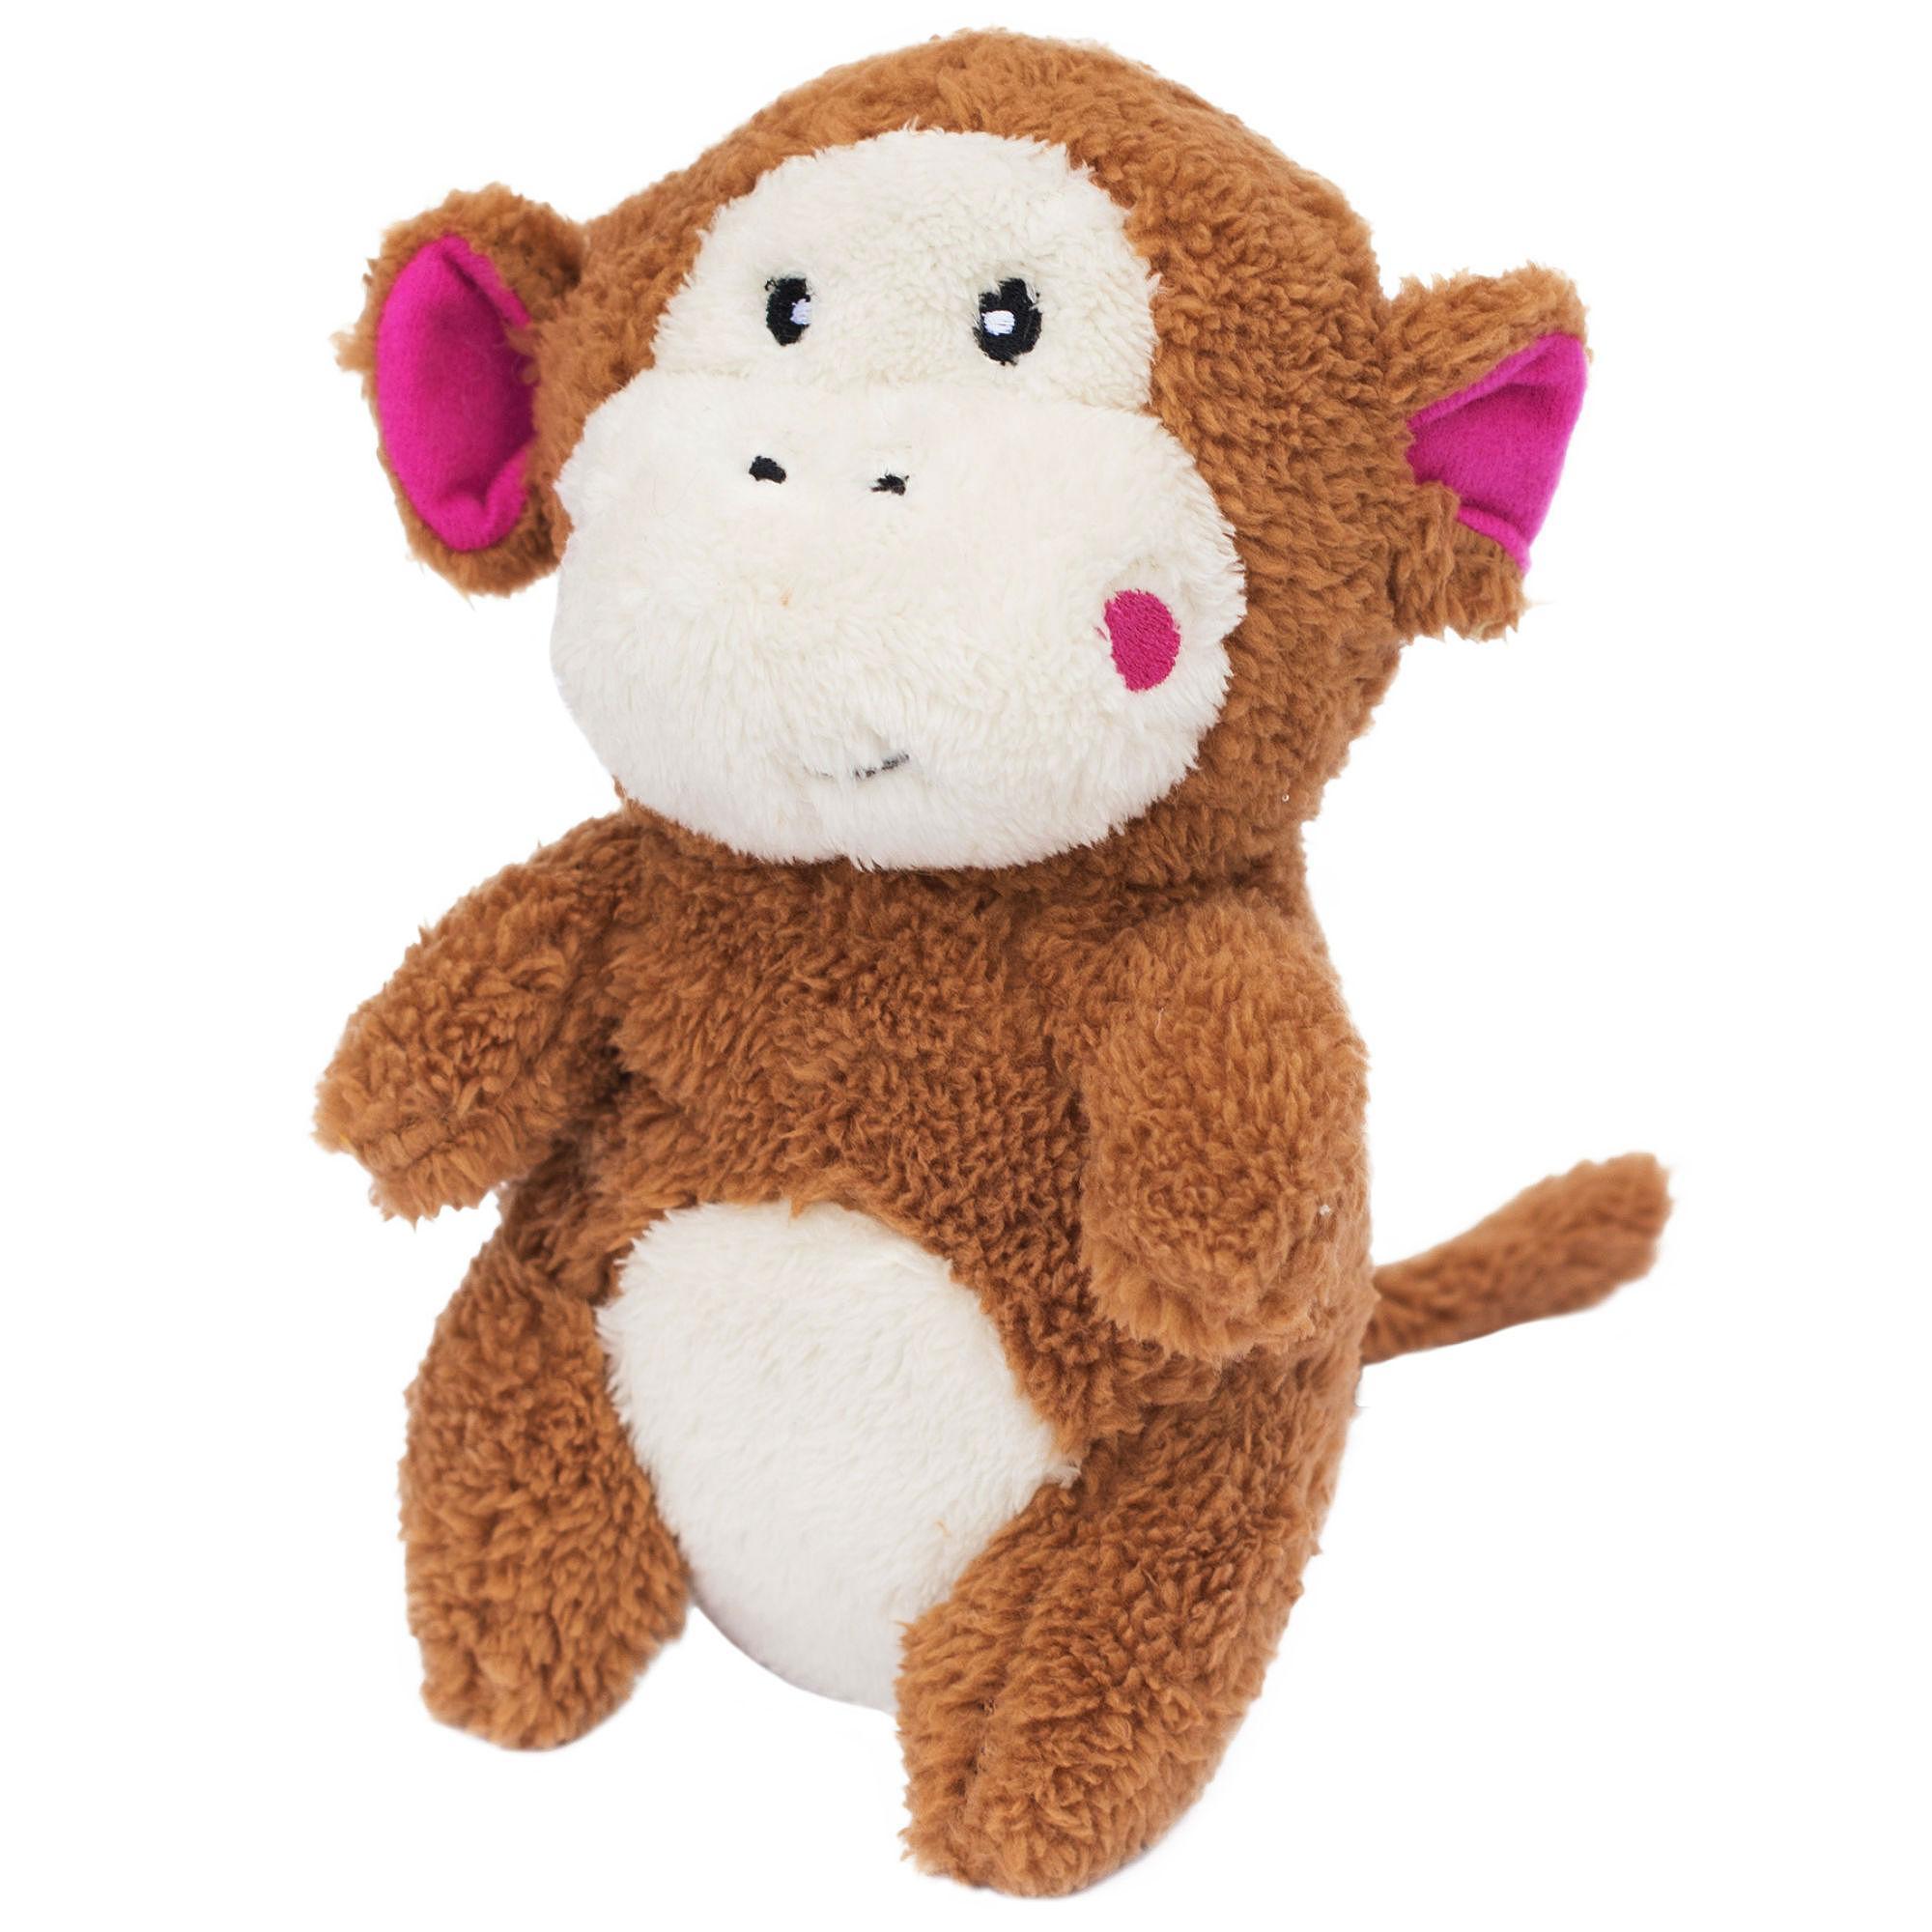 ZippyPaws Cheeky Chumz Dog Toy - Monkey